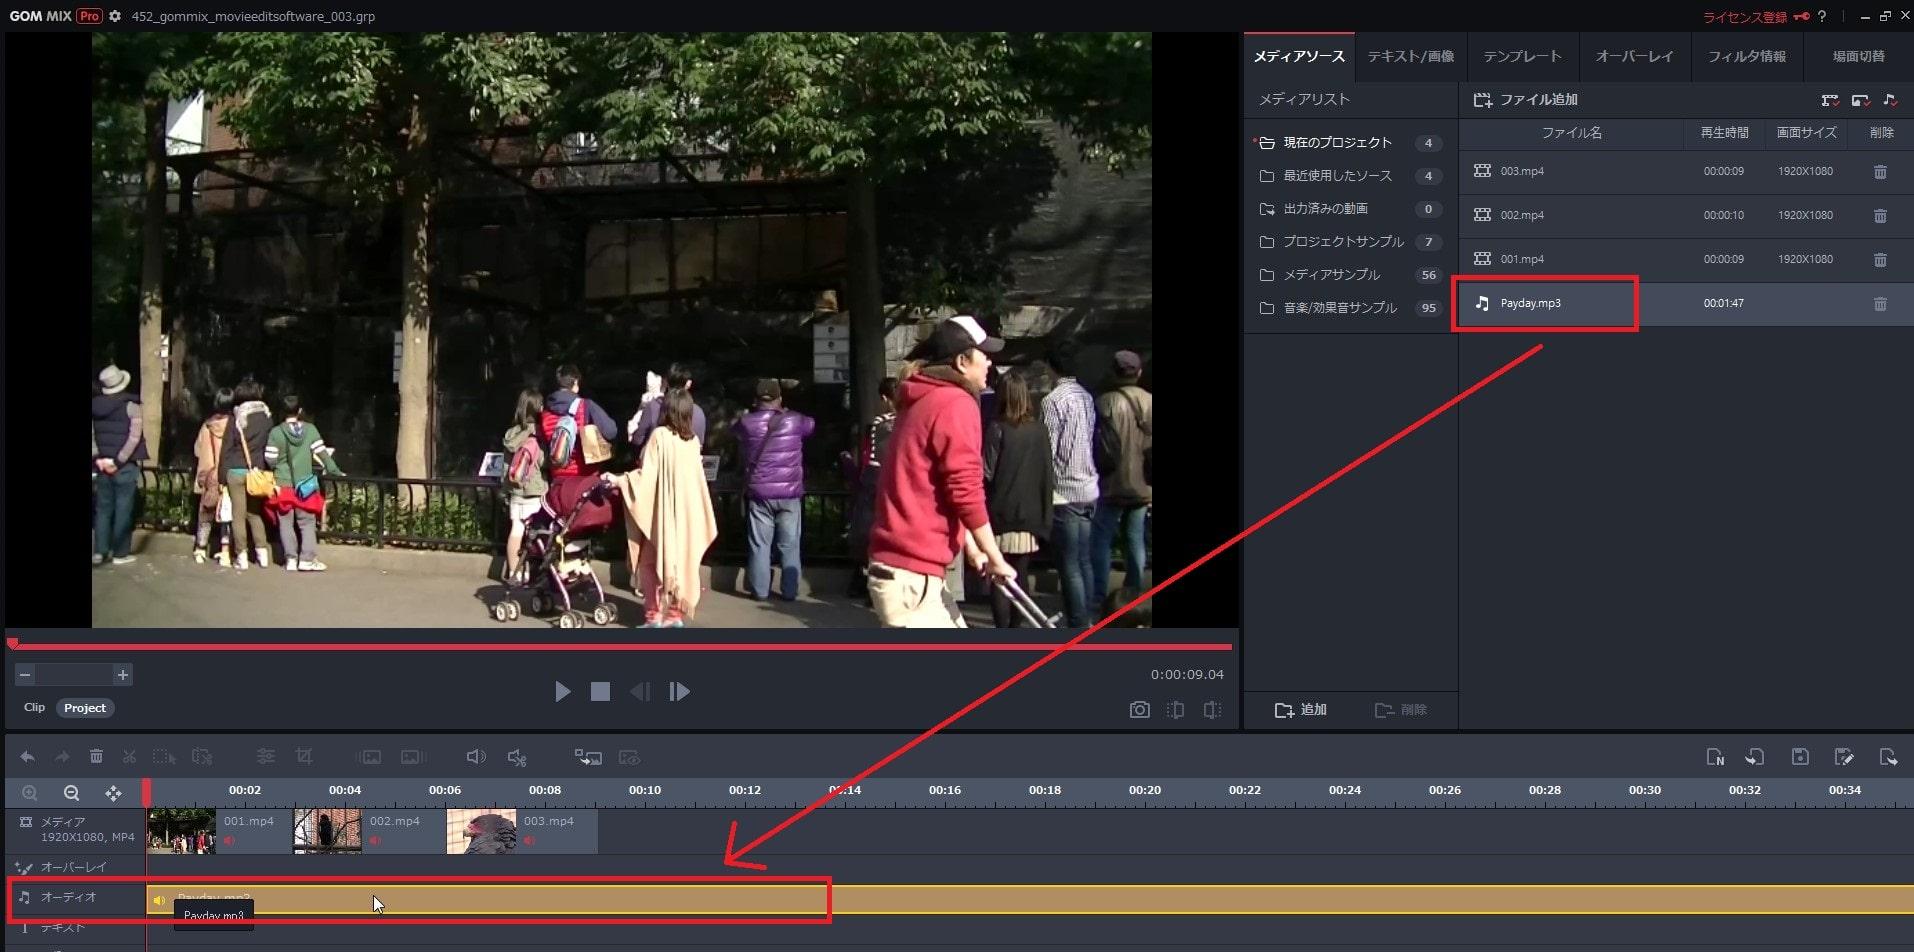 BGM音楽ファイルをタイムラインに読み込む方法 動画編集ソフトGOM Mix Pro